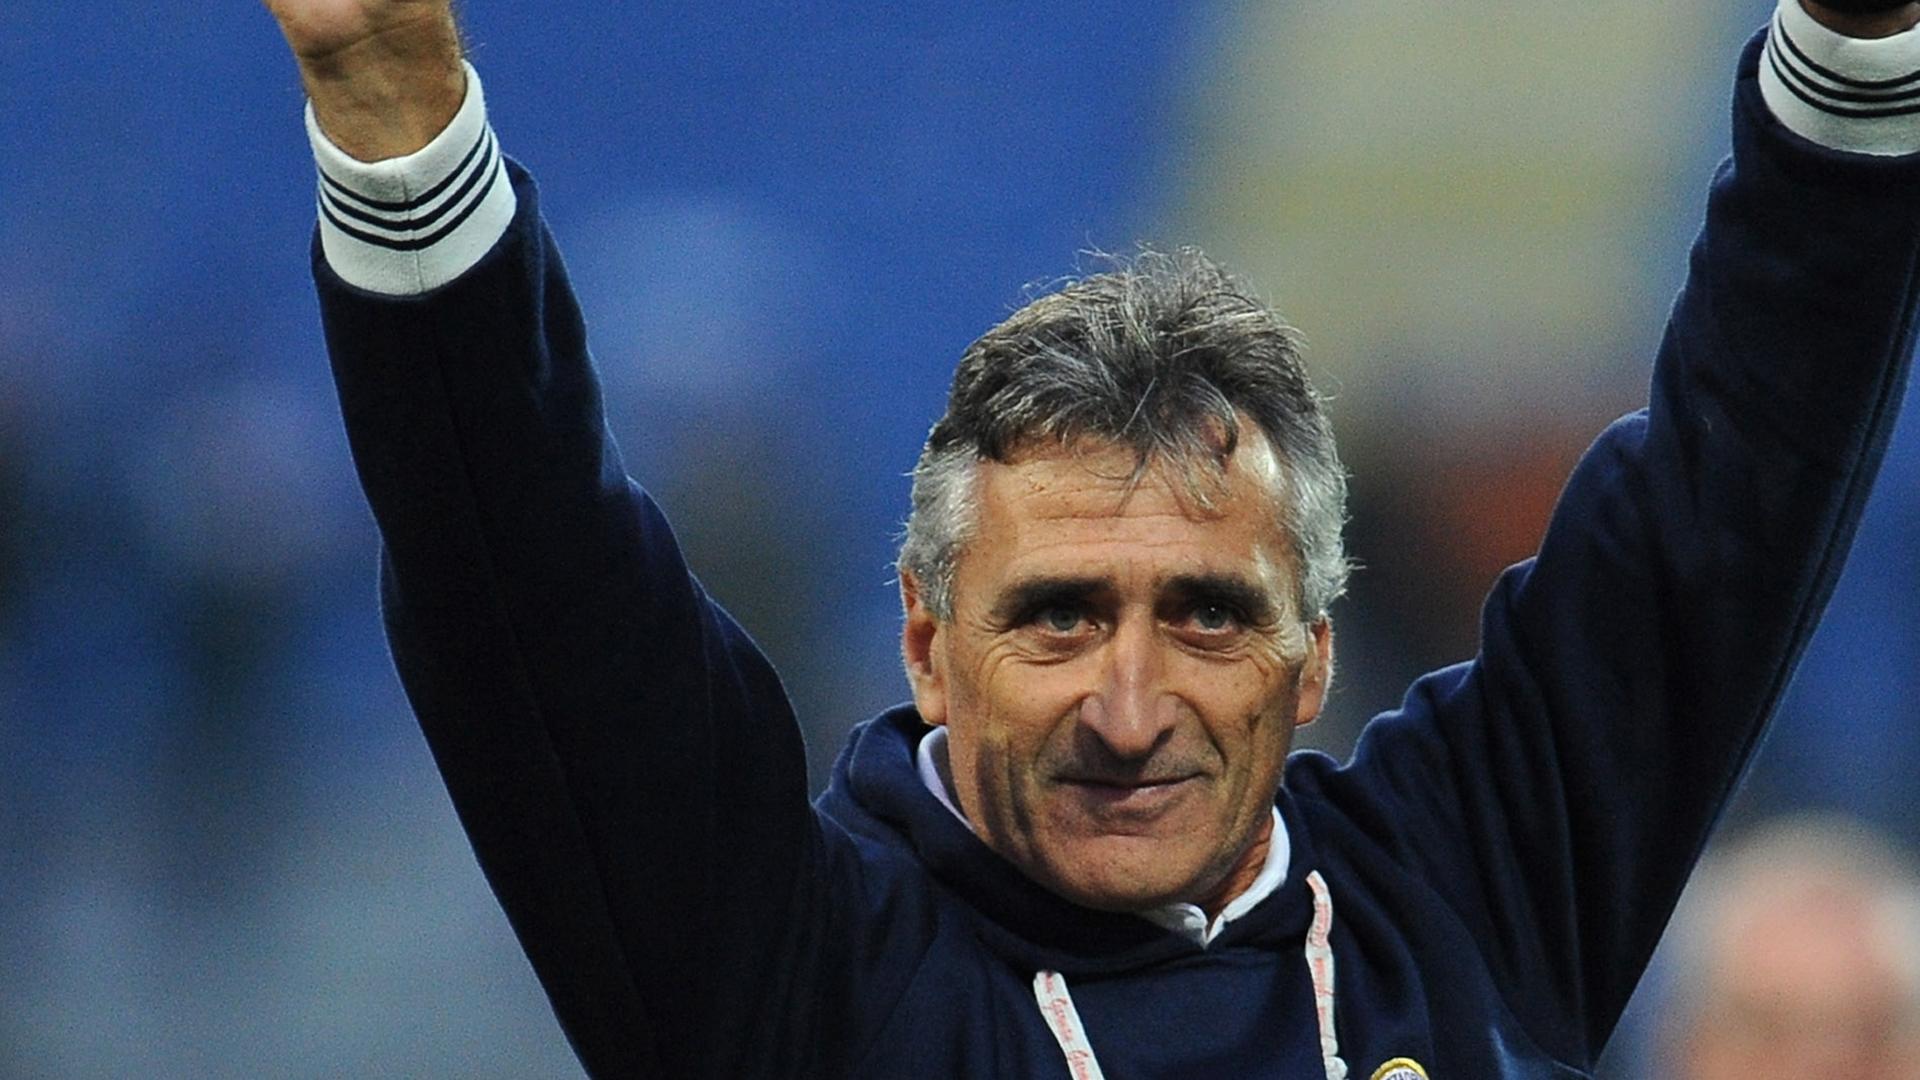 Serie B: Perugia-Pro Vercelli, gli highlights